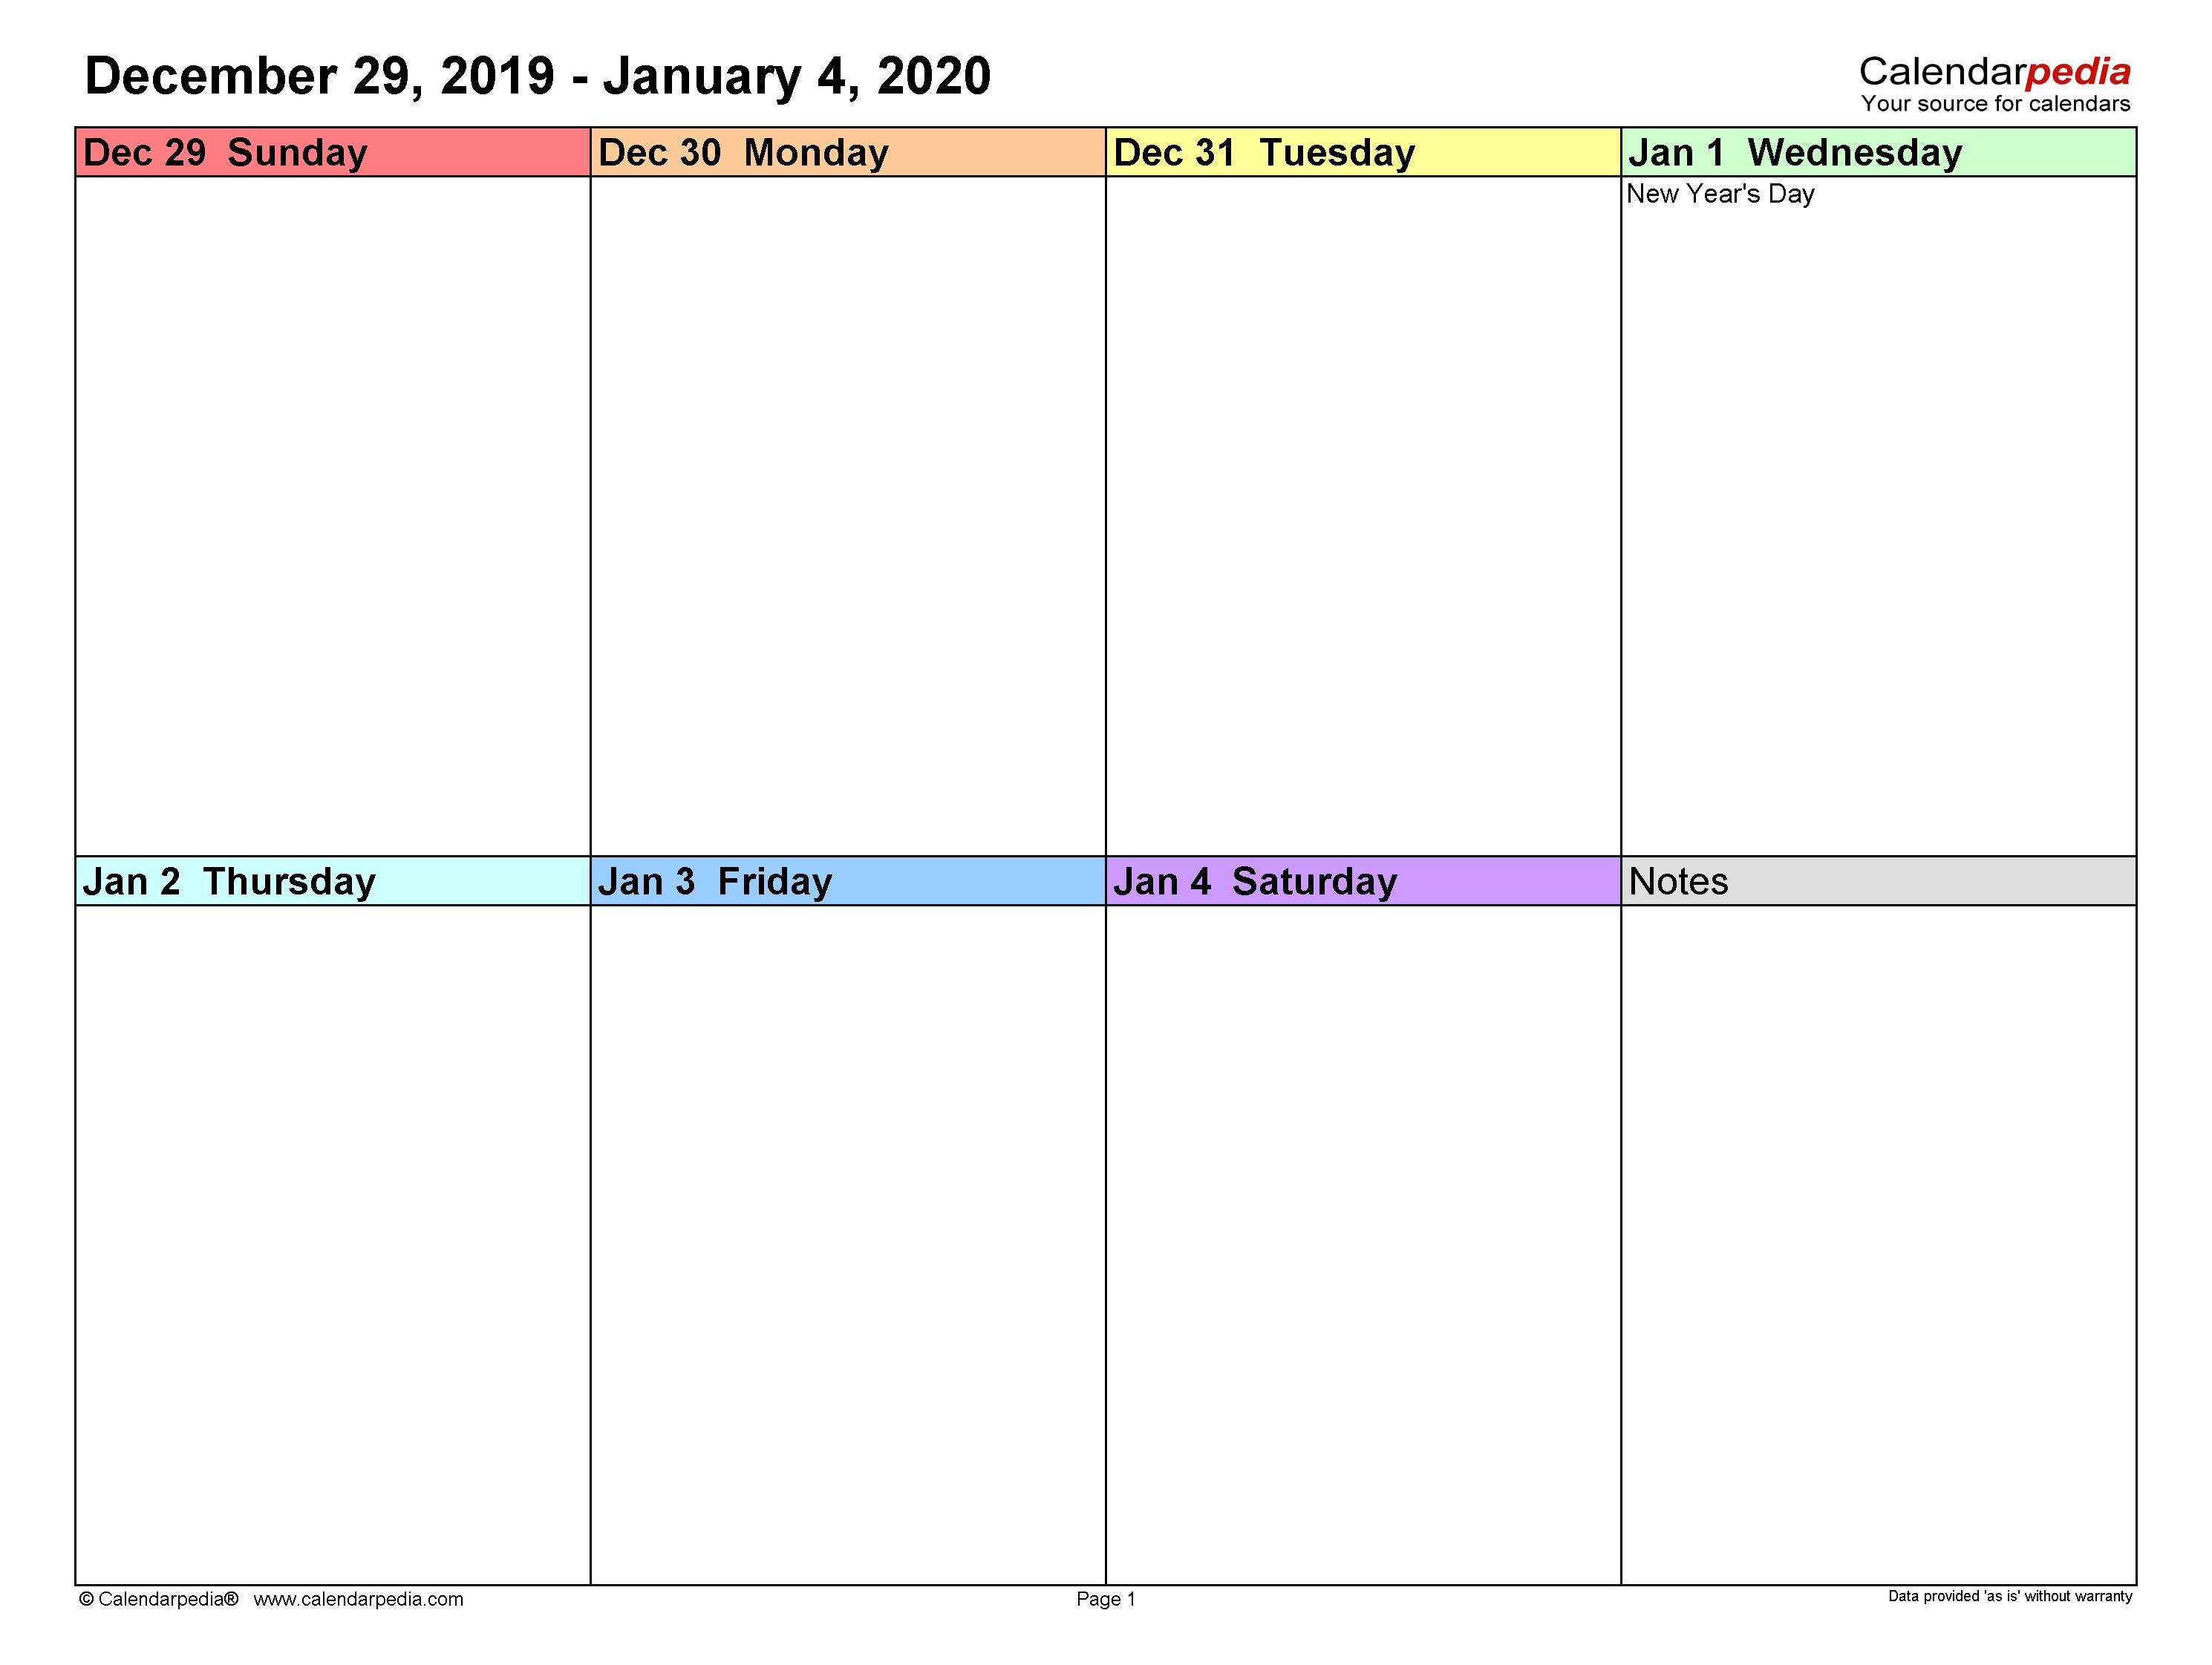 Weekly Calendars 2020 For Word - 12 Free Printable Templates Calendar Template One Week